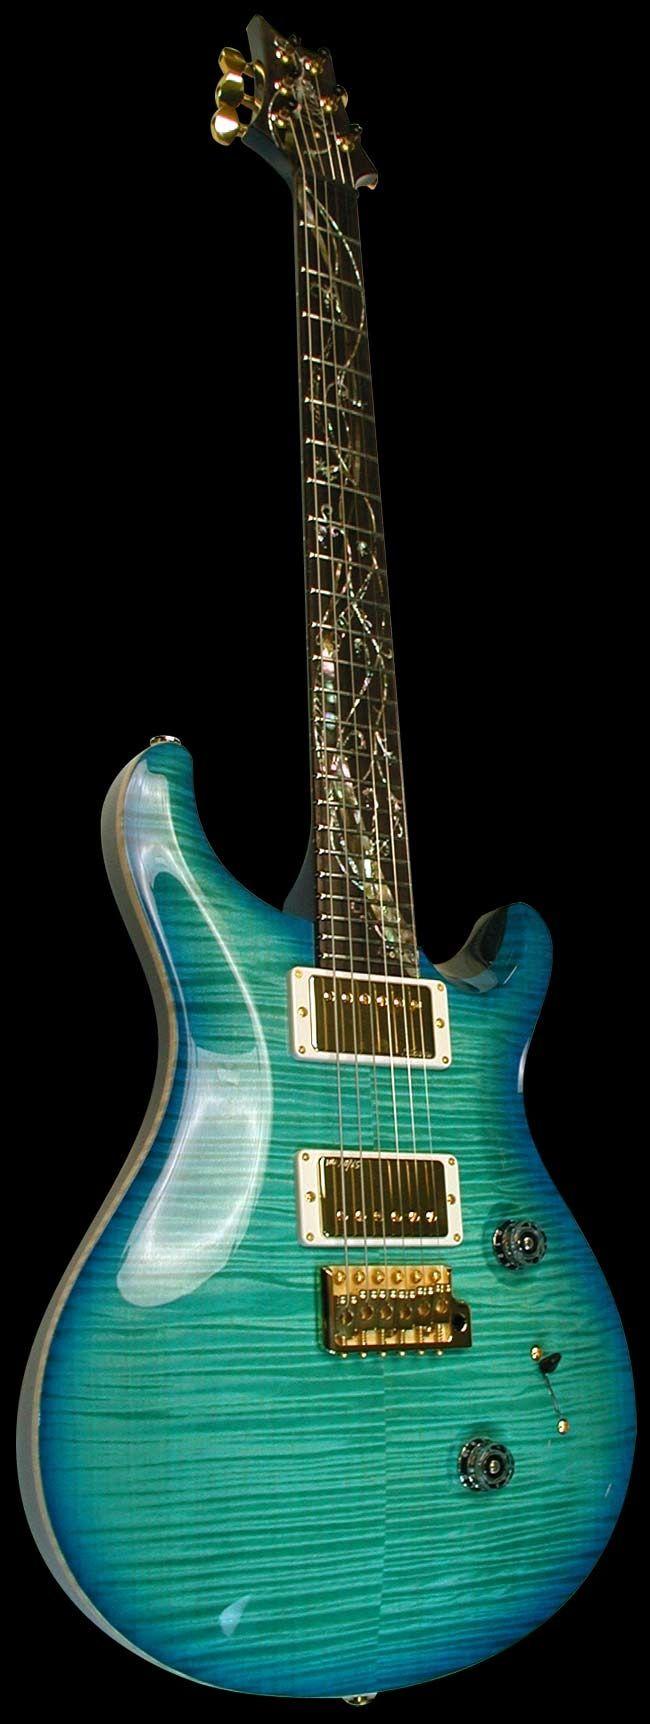 17 Best Images About Guitar Stuff On Pinterest Left